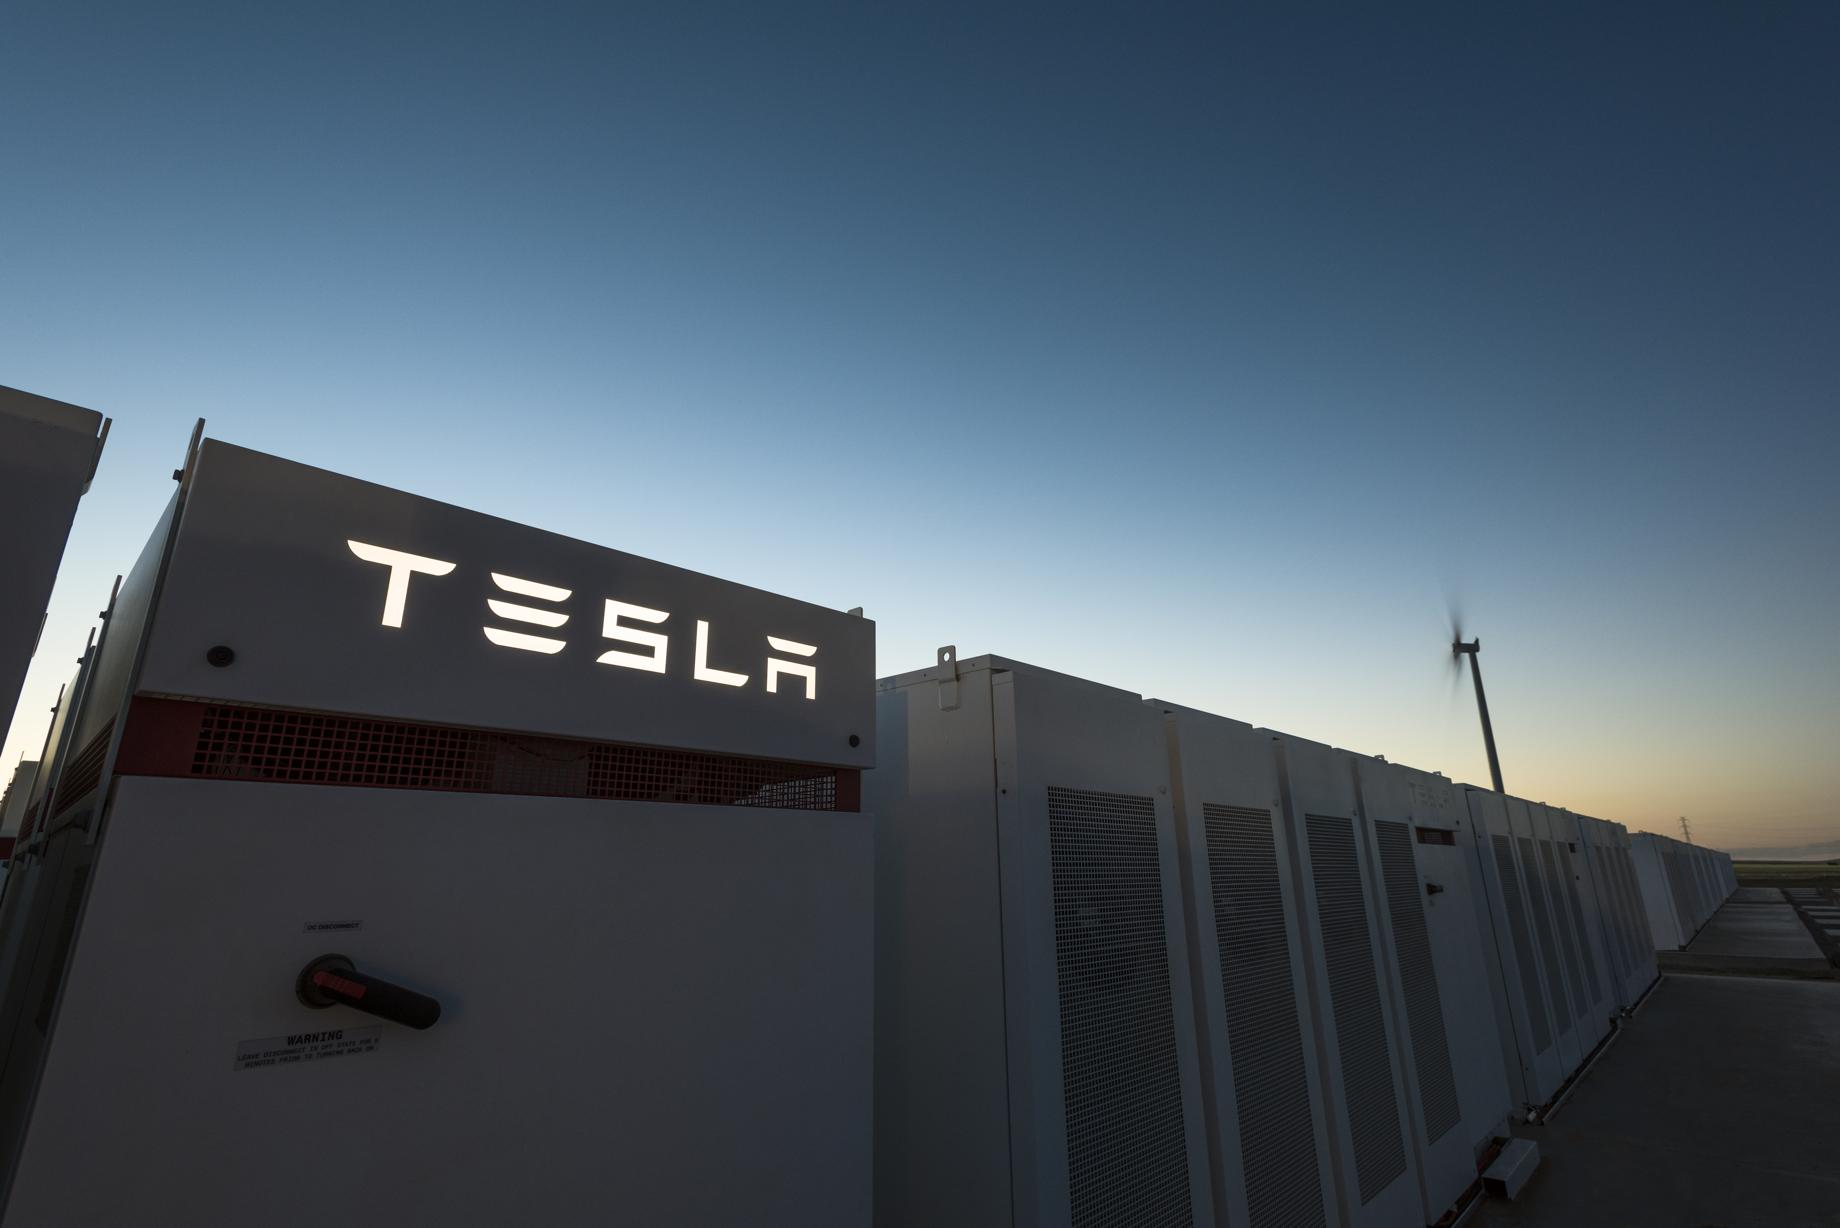 Tesla-South-Australia-Powerpack-2